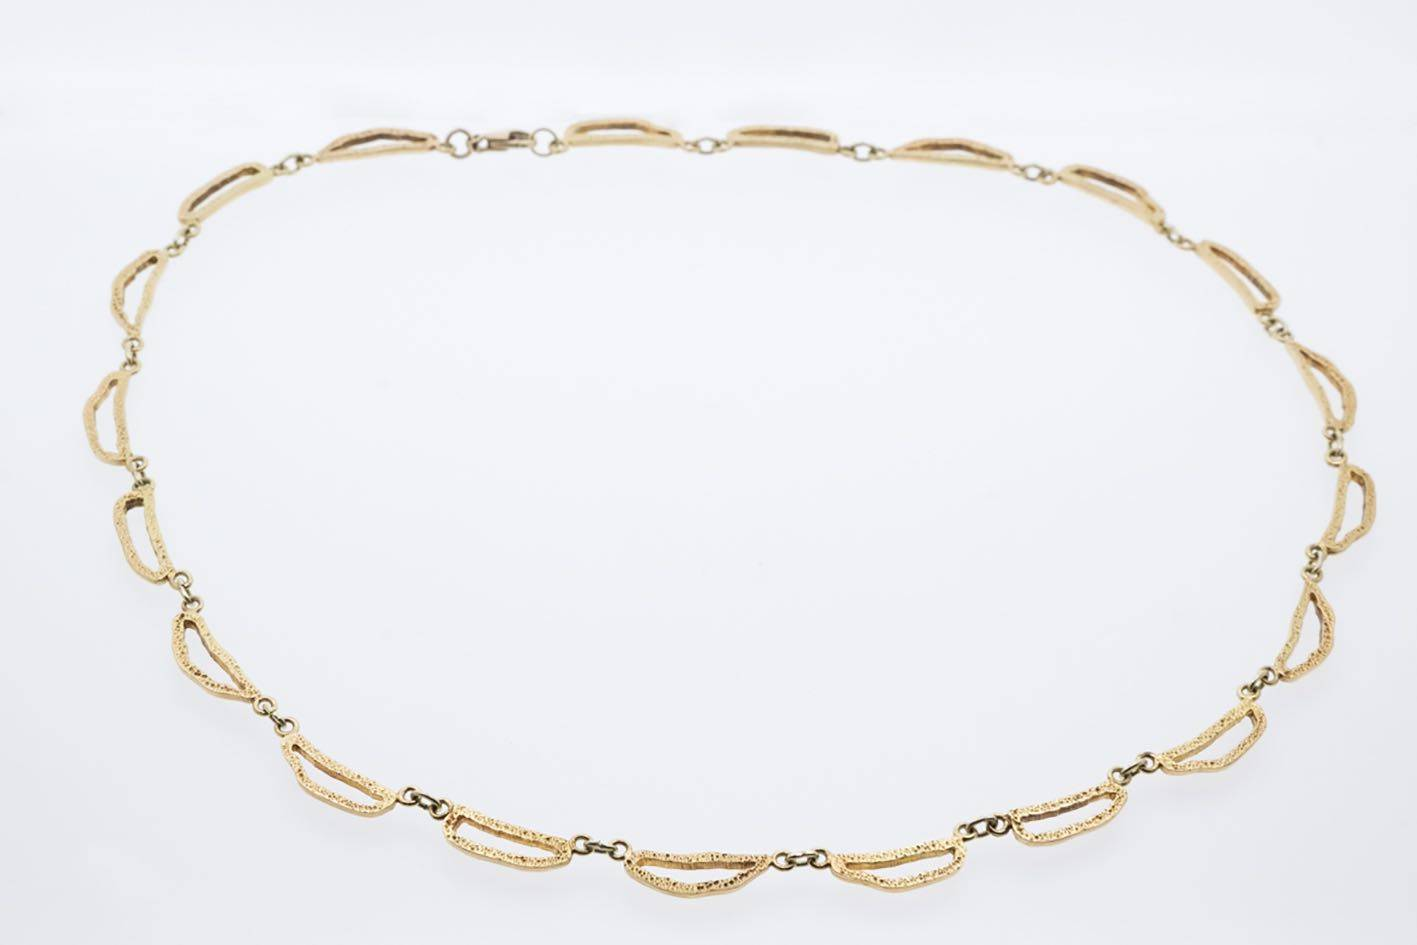 Jonas Maes Jewels - Juwelen - Bruidsjuwelen - Verlovingsring - Trouwring - House of Weddings - 25